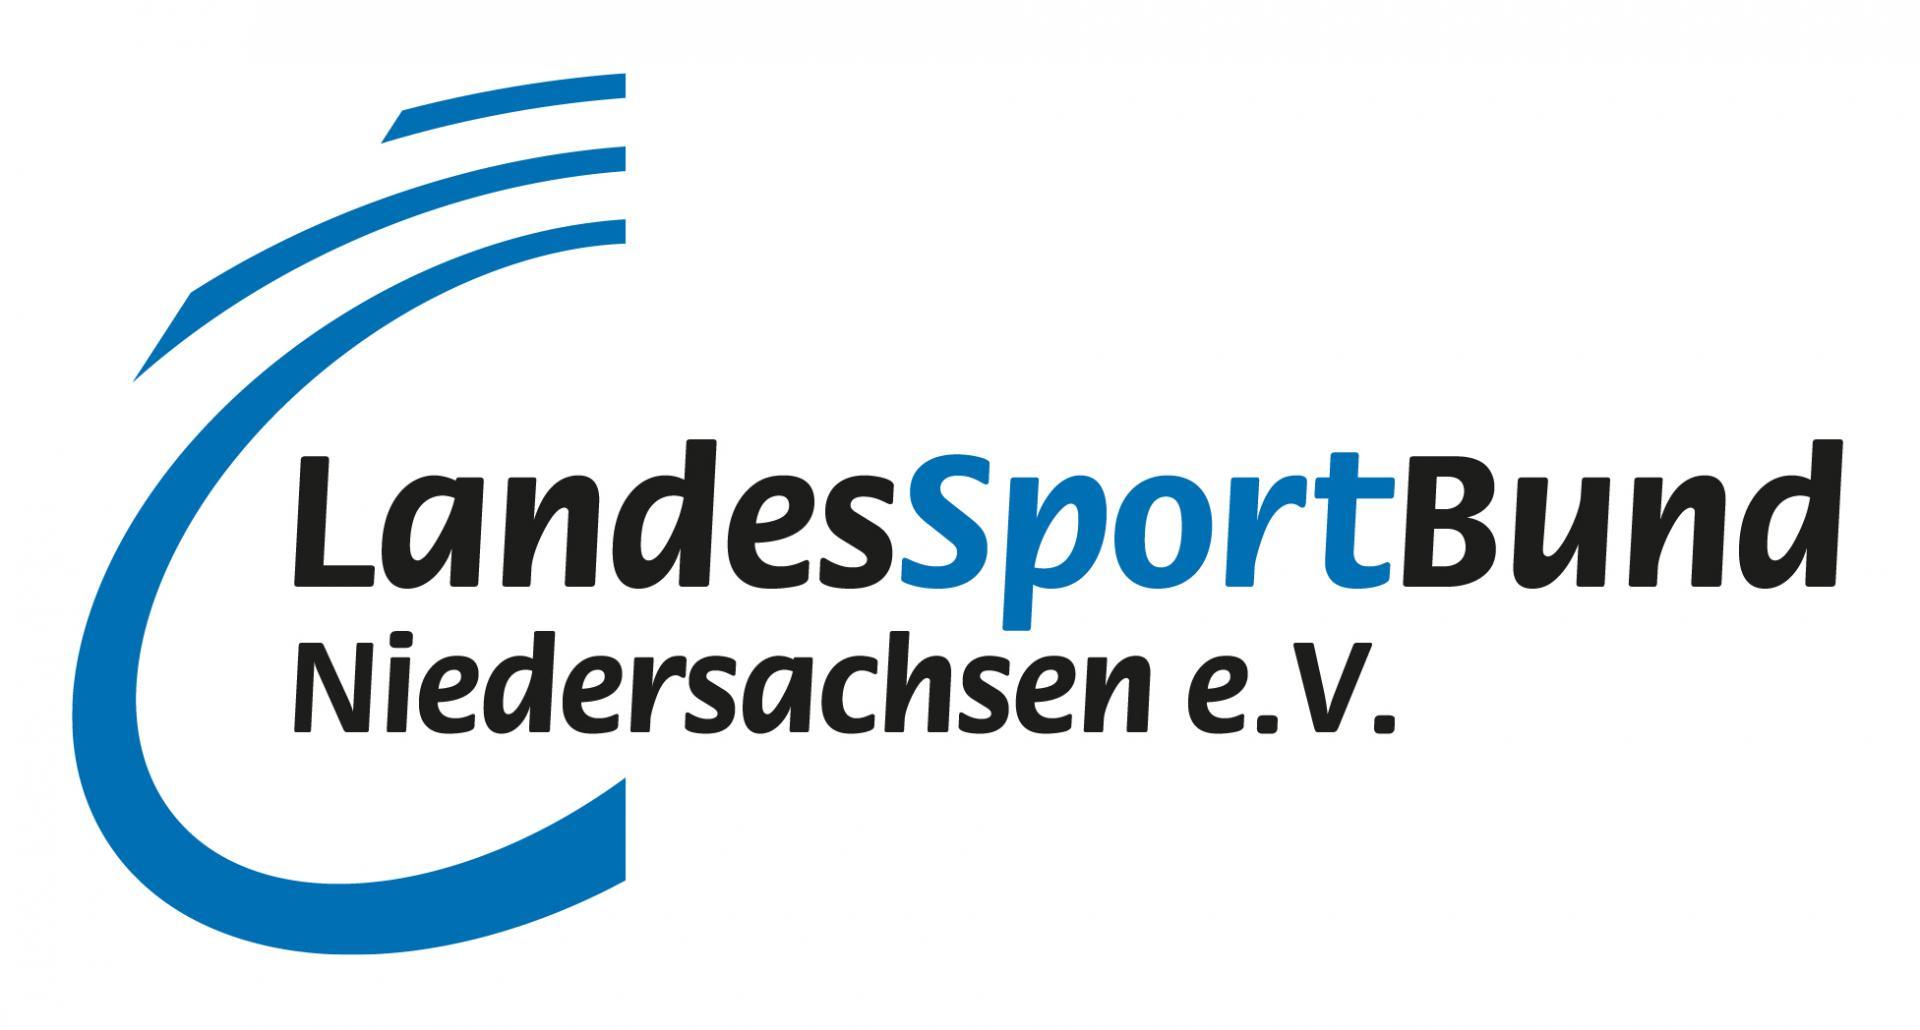 https://www.lsb-niedersachsen.de/presse/fotos-logos/logos